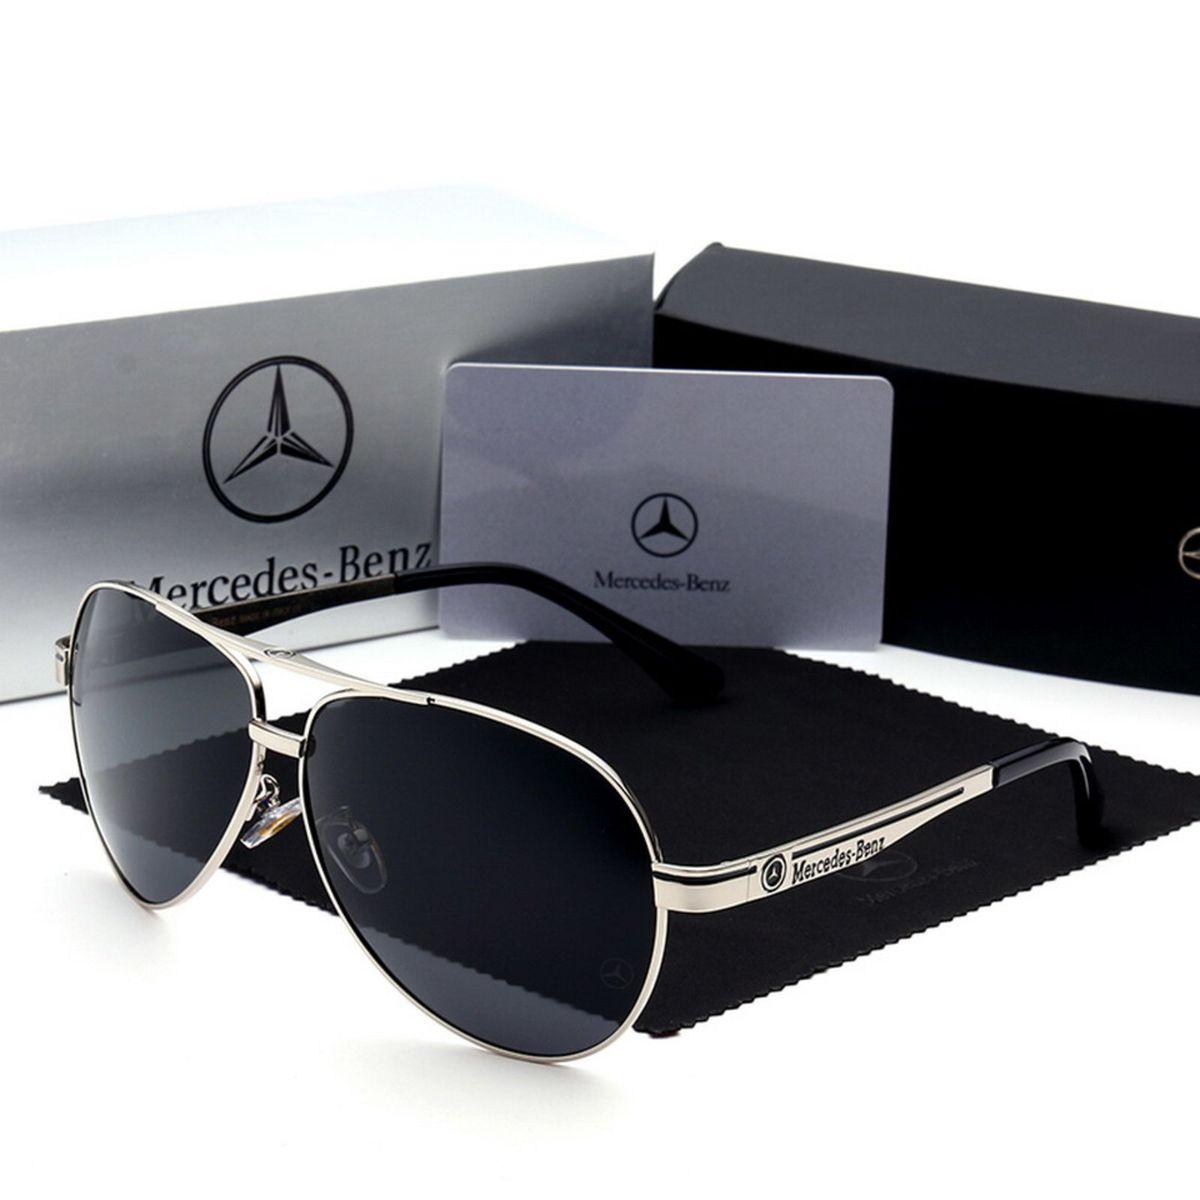 59fac0083 Óculos de Sol Mercedes Benz Metal Polarizado Uv400 Luxo | Óculos Masculino  Mercedes Benz Nunca Usado 28877276 | enjoei